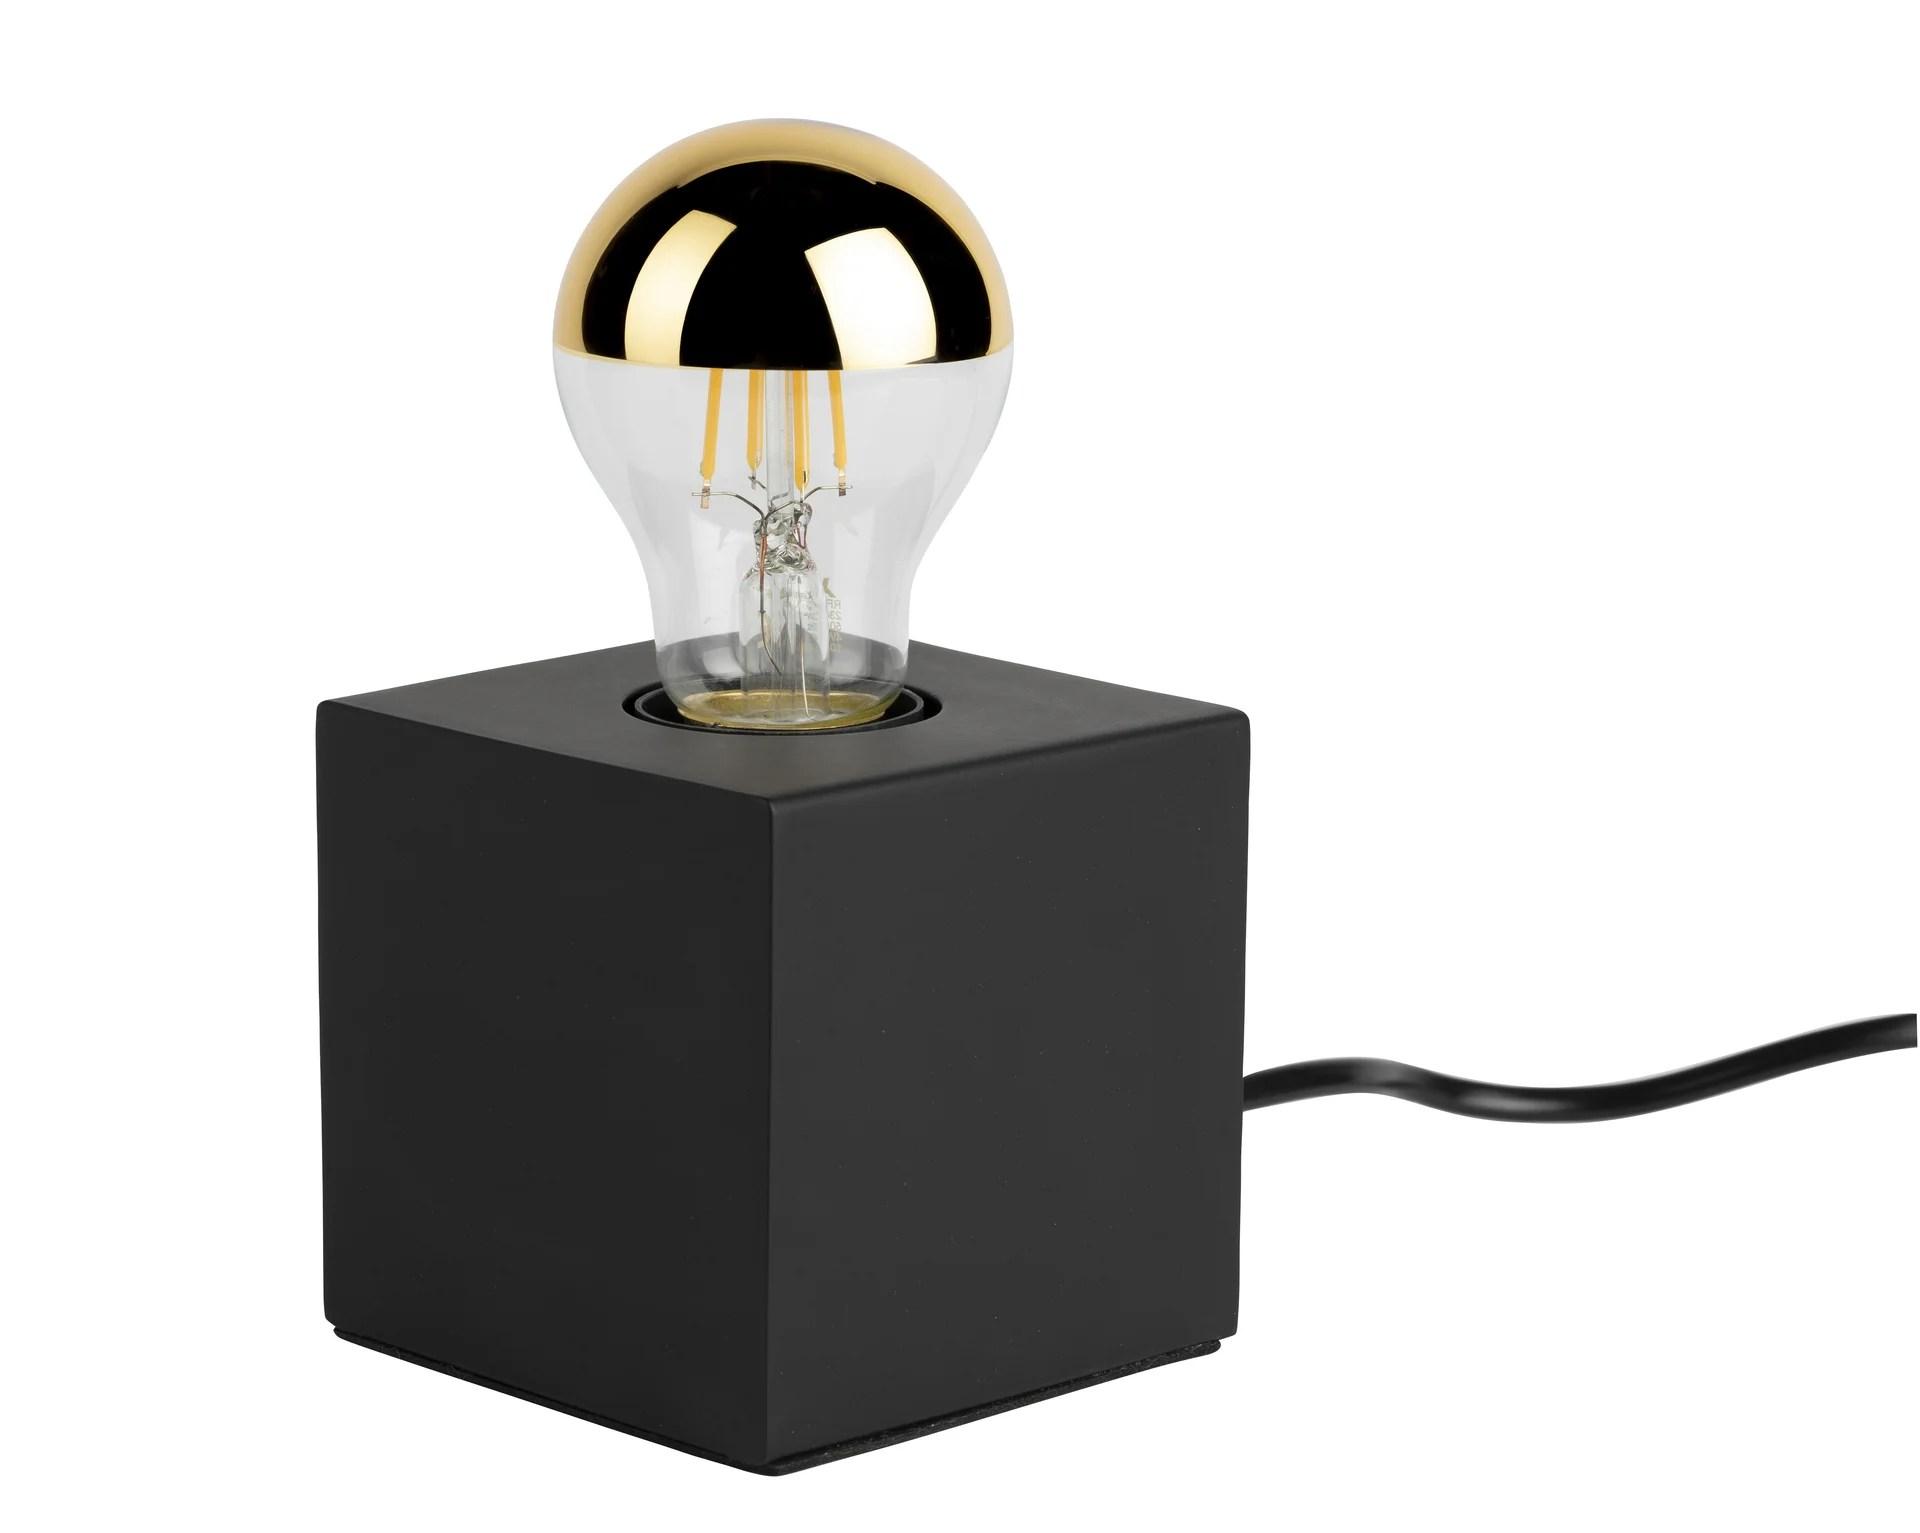 Lampe Moderne Metal Noir Mat Tactile Mathias Ludvig Leroy Merlin